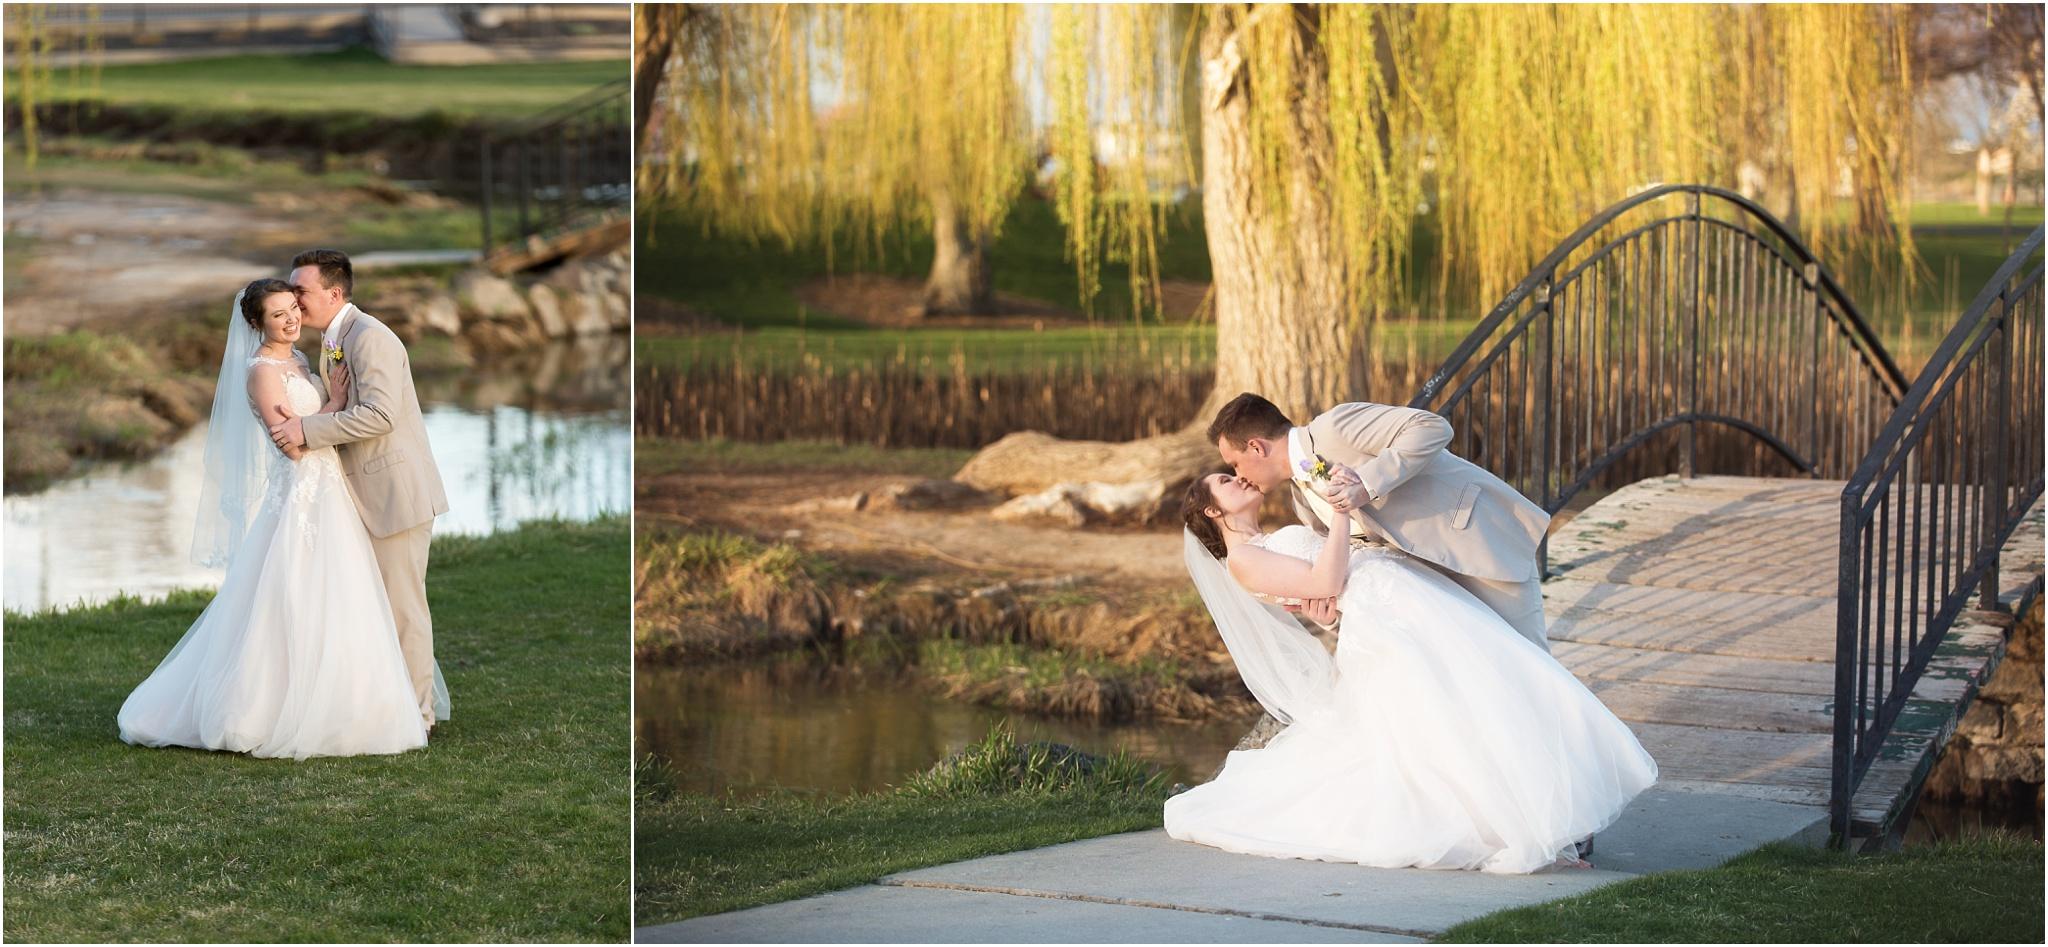 Wedding Photography_Meridian Idaho_Nampa Idaho_Leah Southwick Photography_0073.jpg